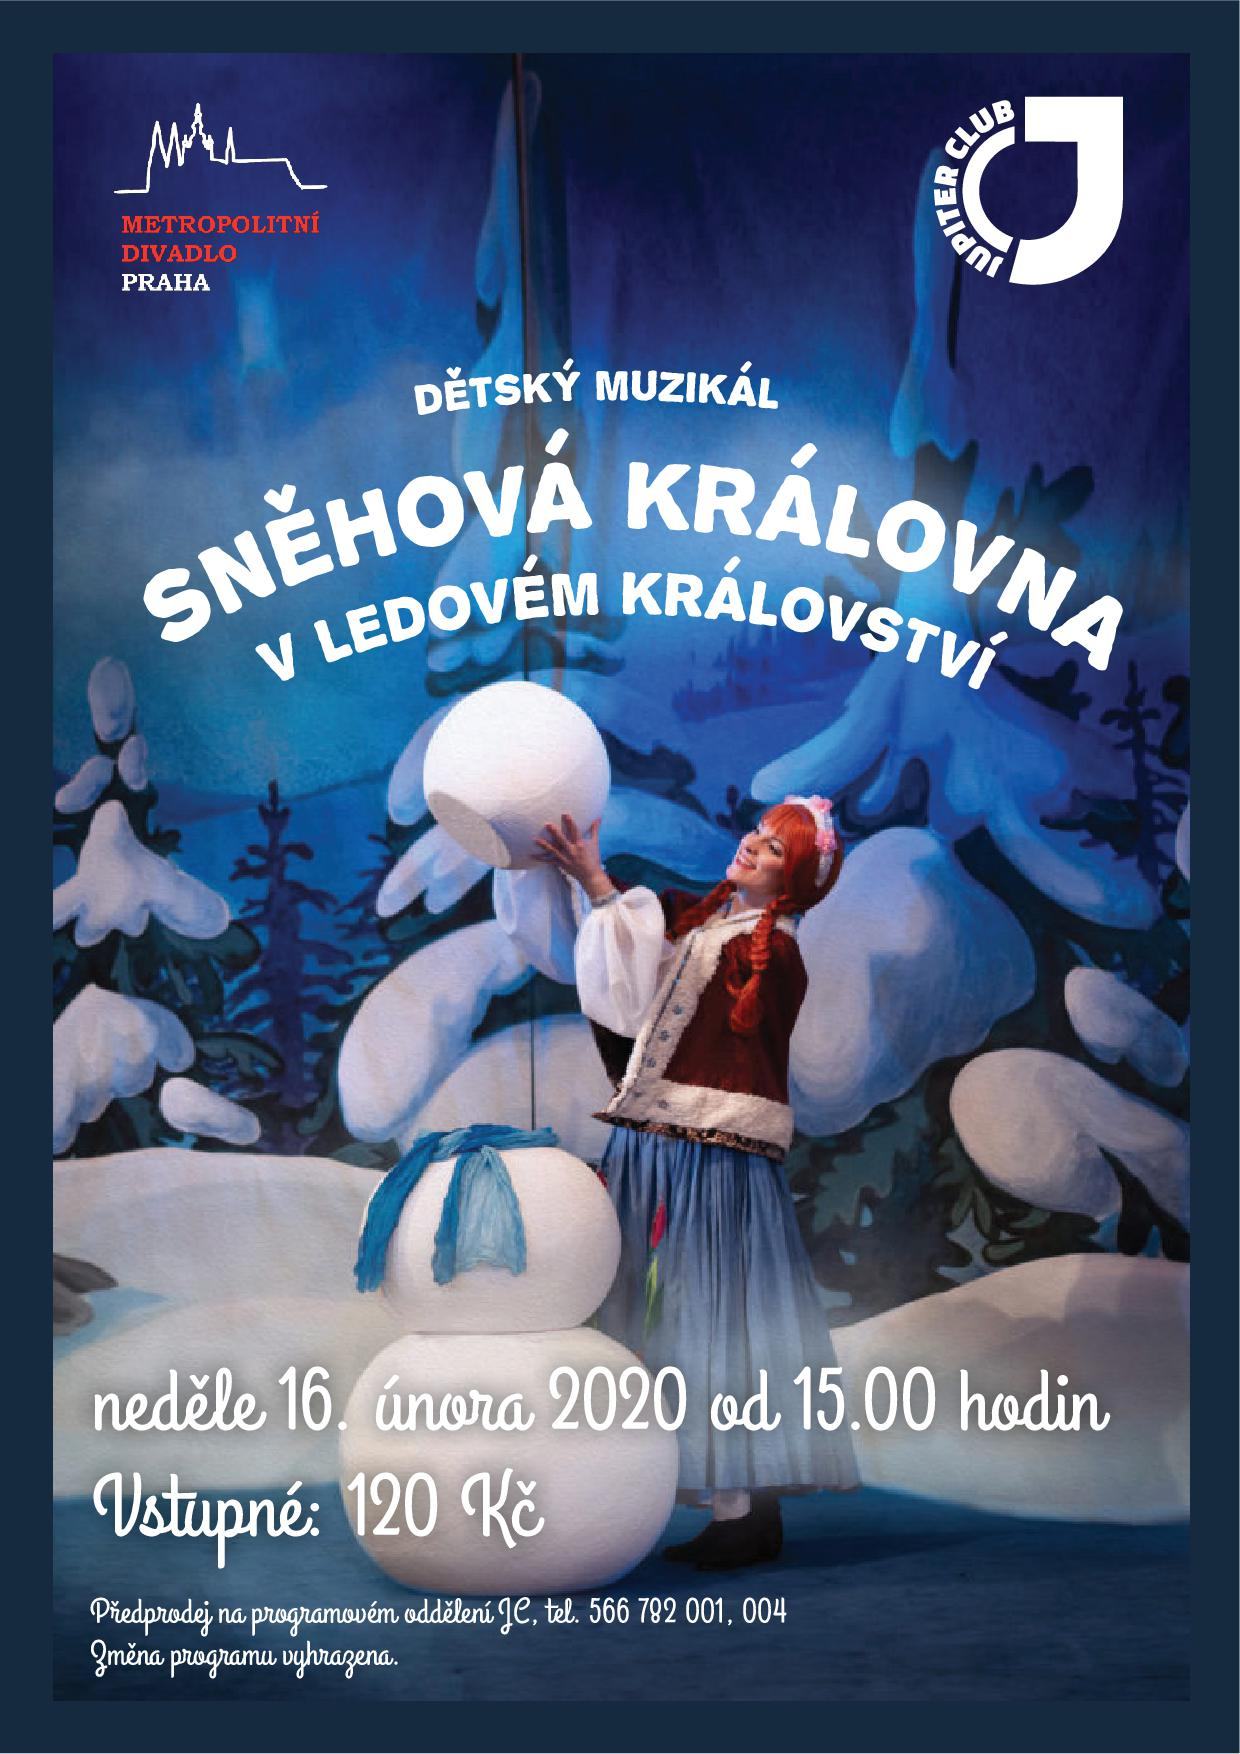 A3 poster snehova kralovna